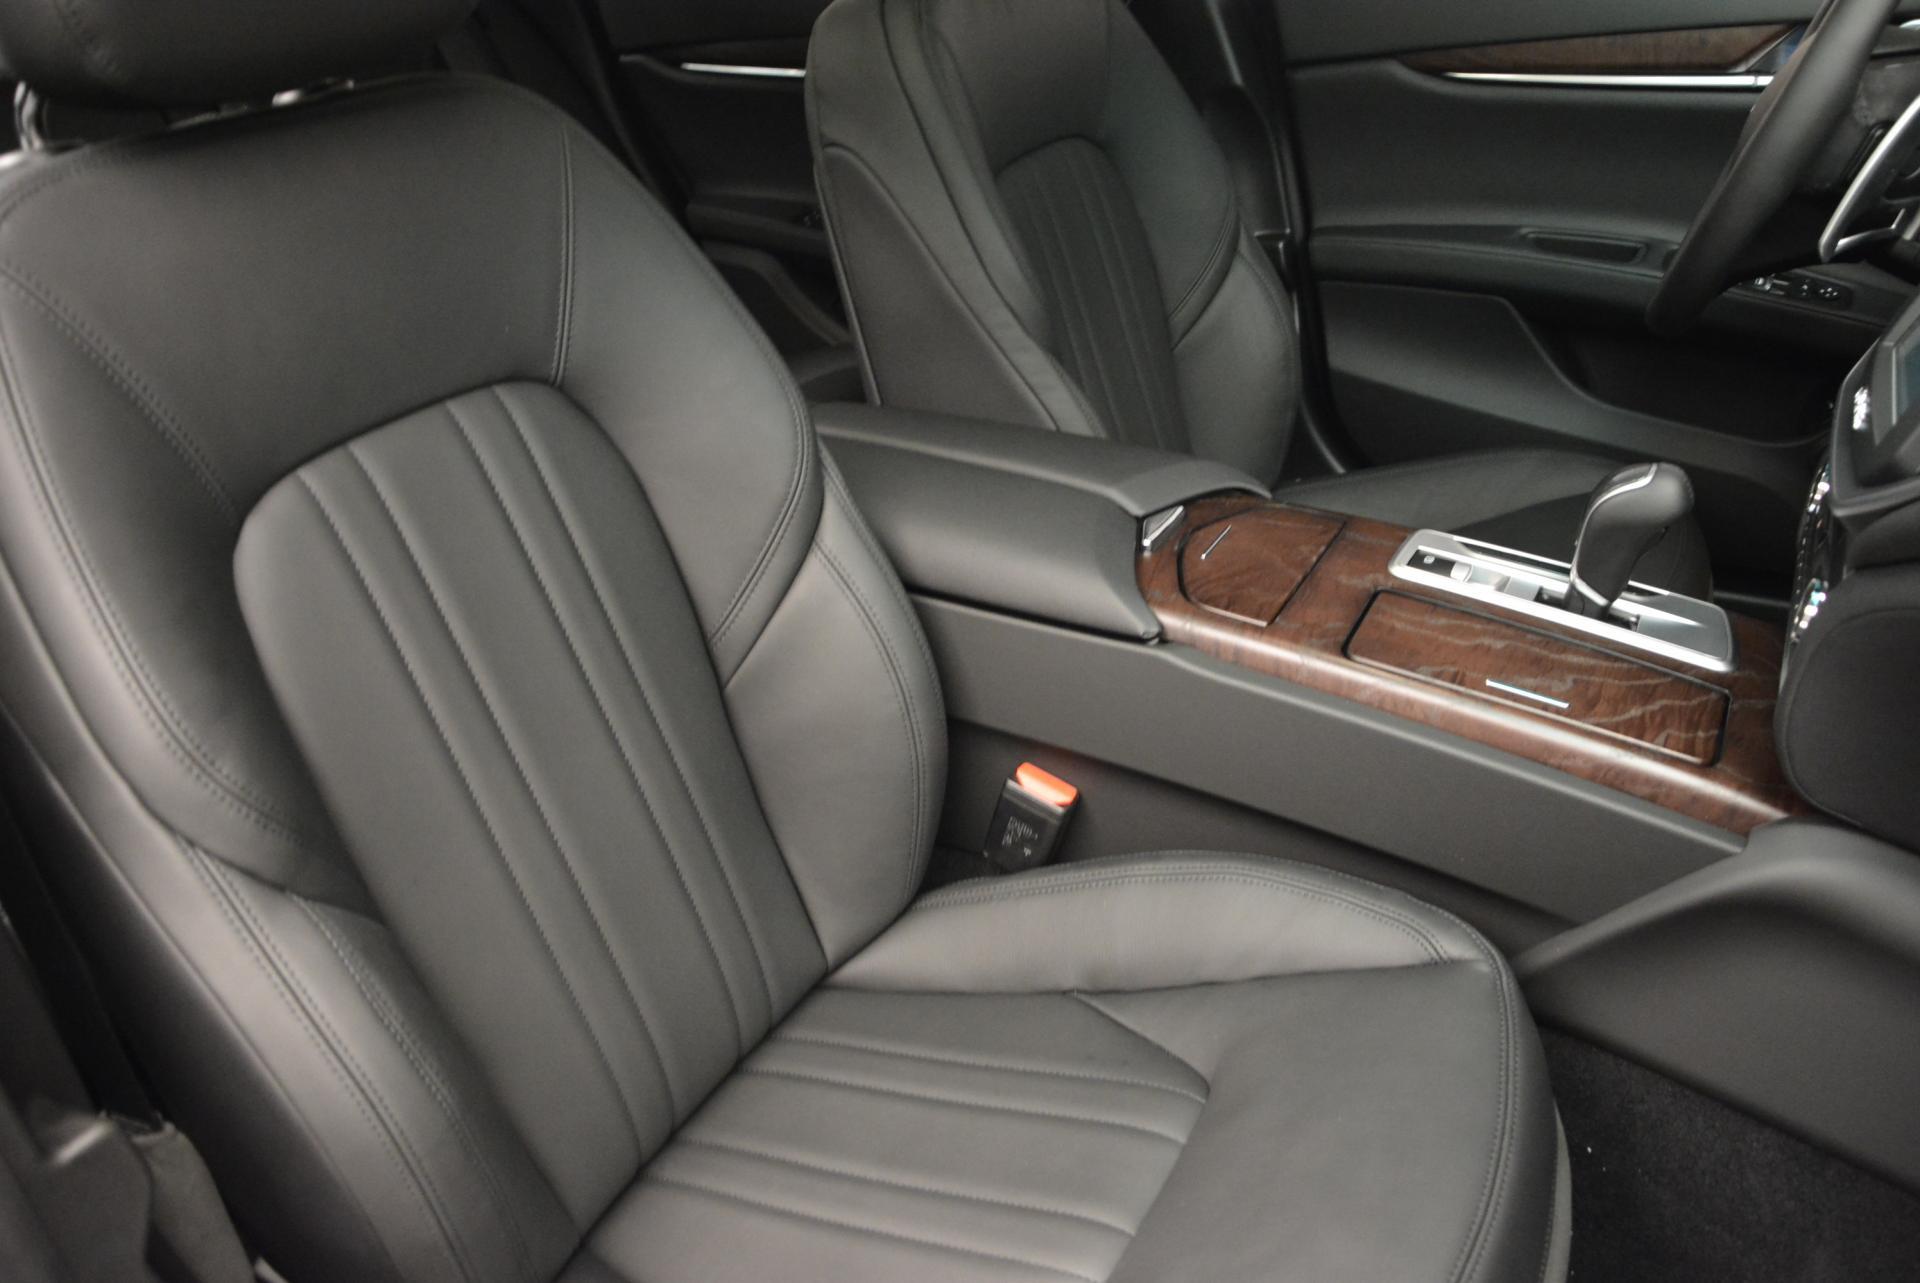 Used 2015 Maserati Ghibli S Q4 For Sale In Greenwich, CT. Alfa Romeo of Greenwich, M1358 119_p19